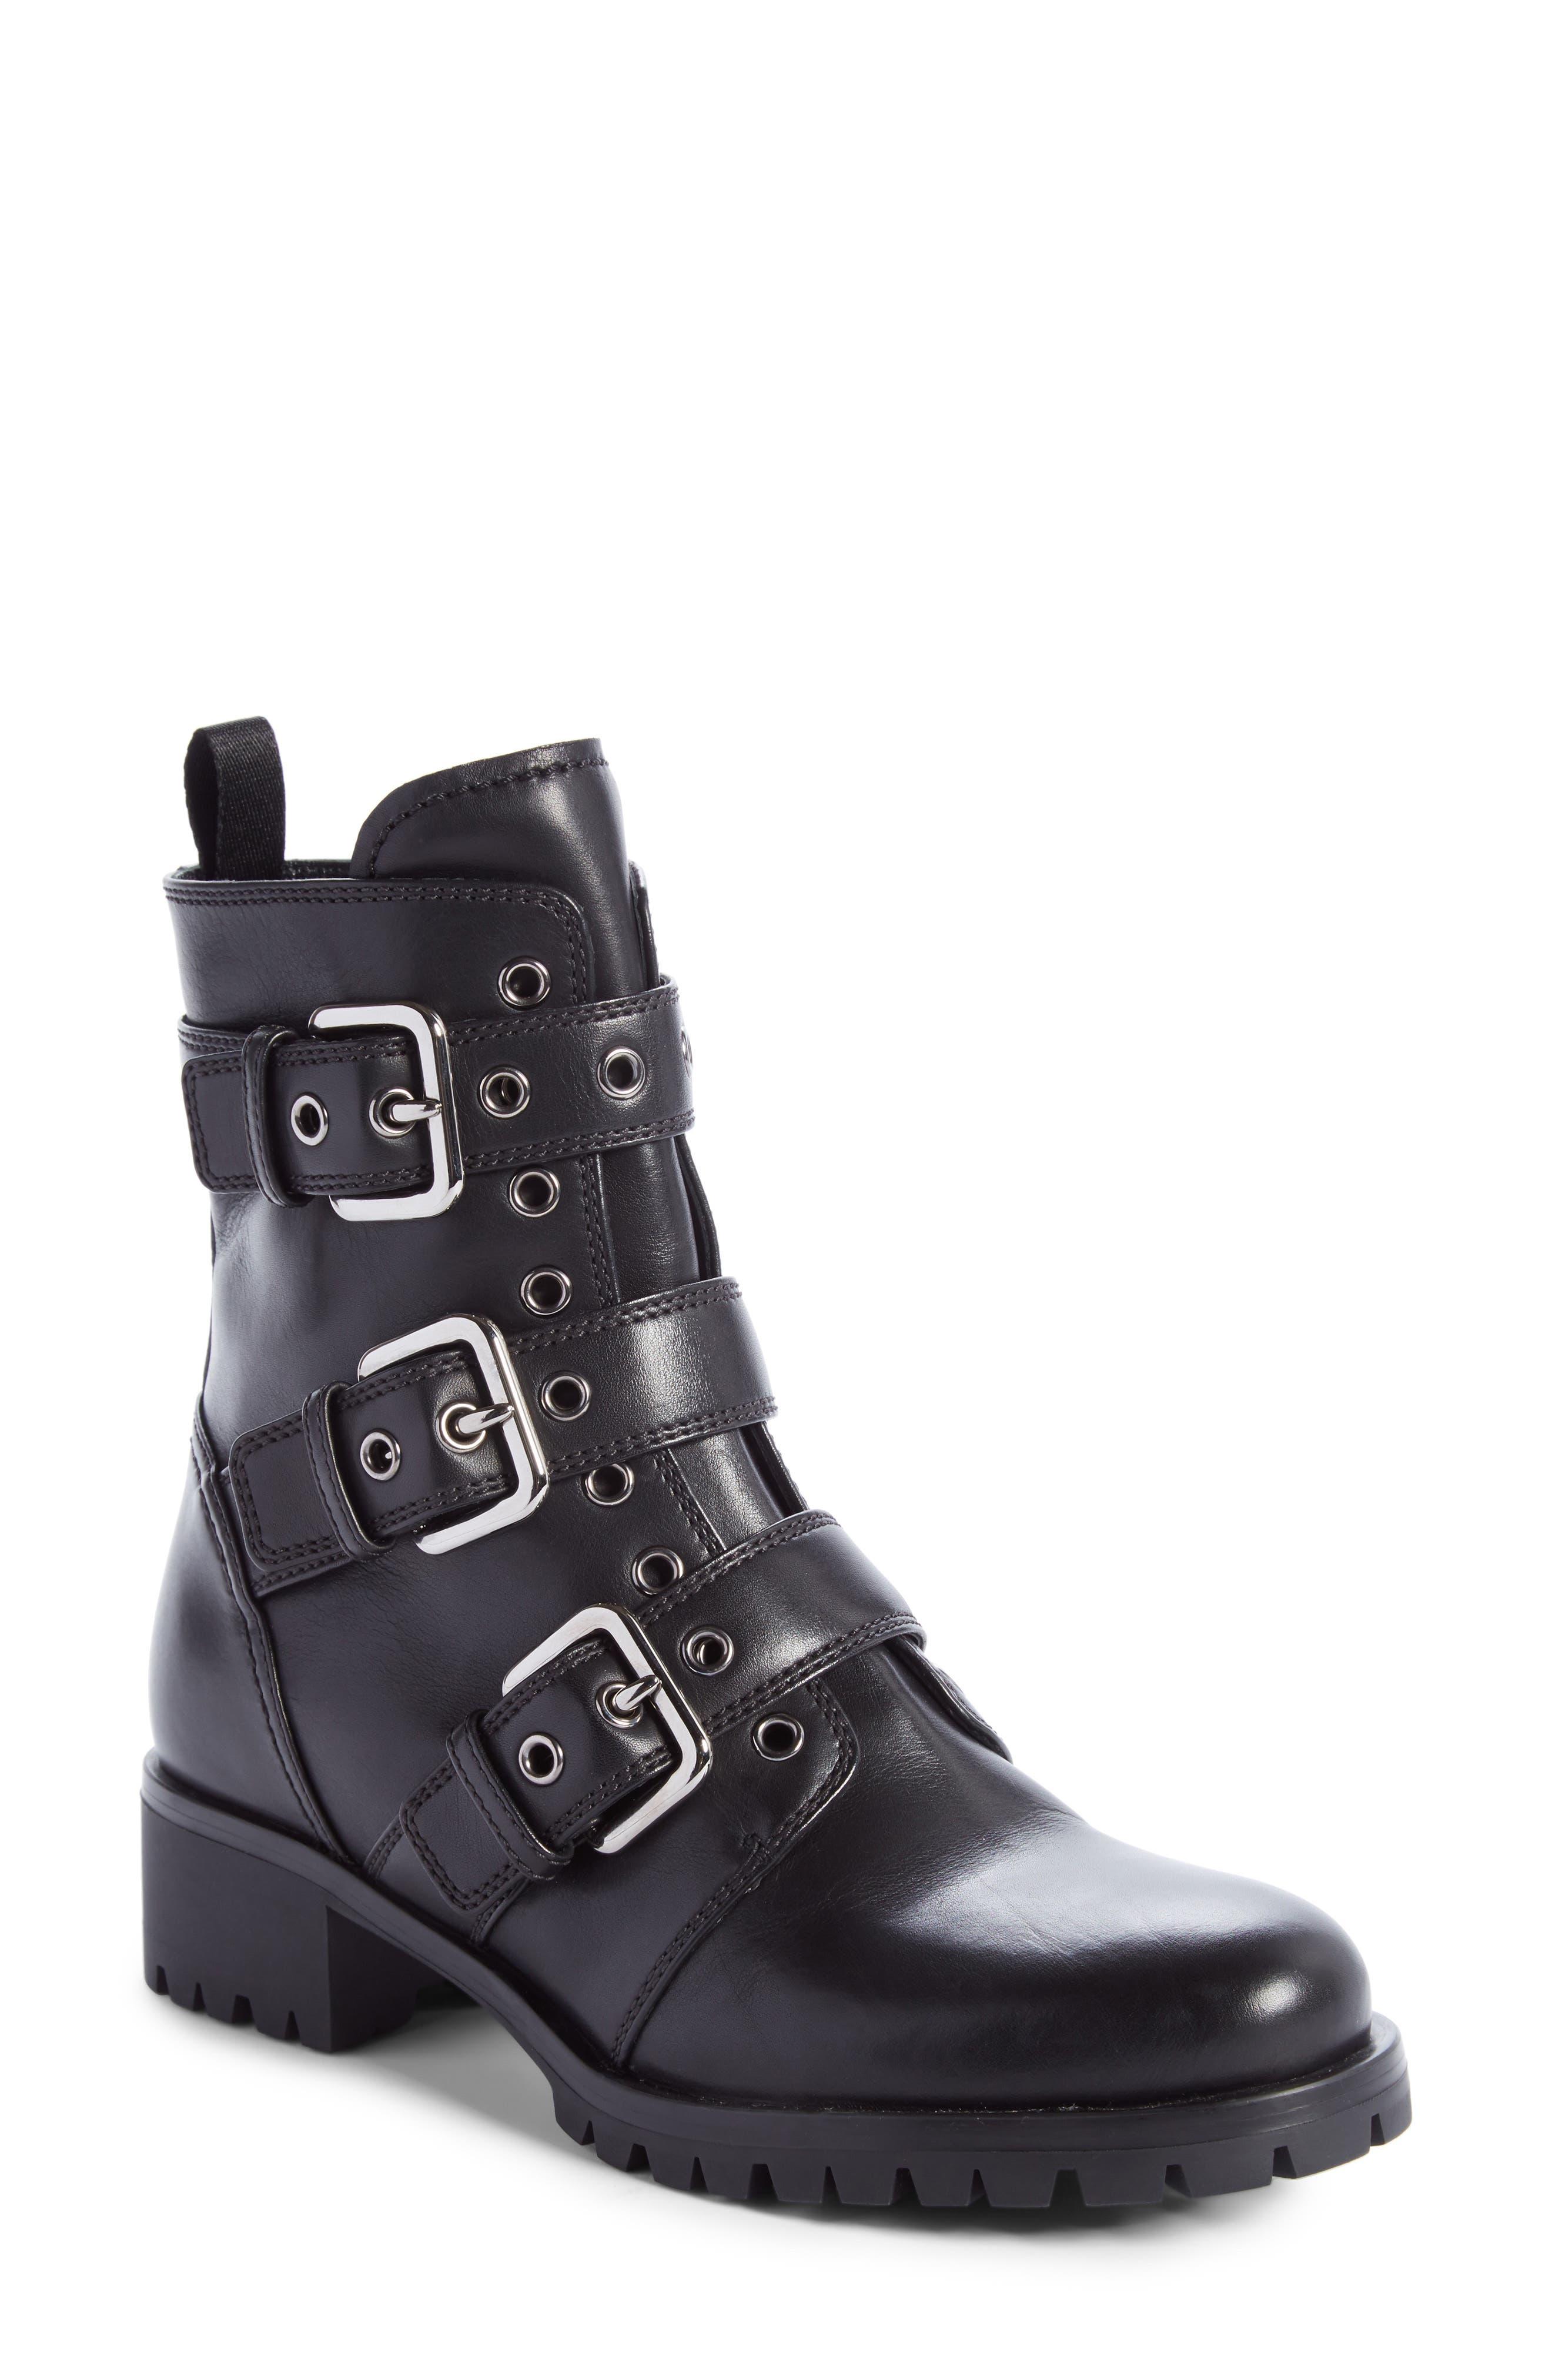 PRADA Buckle Boot